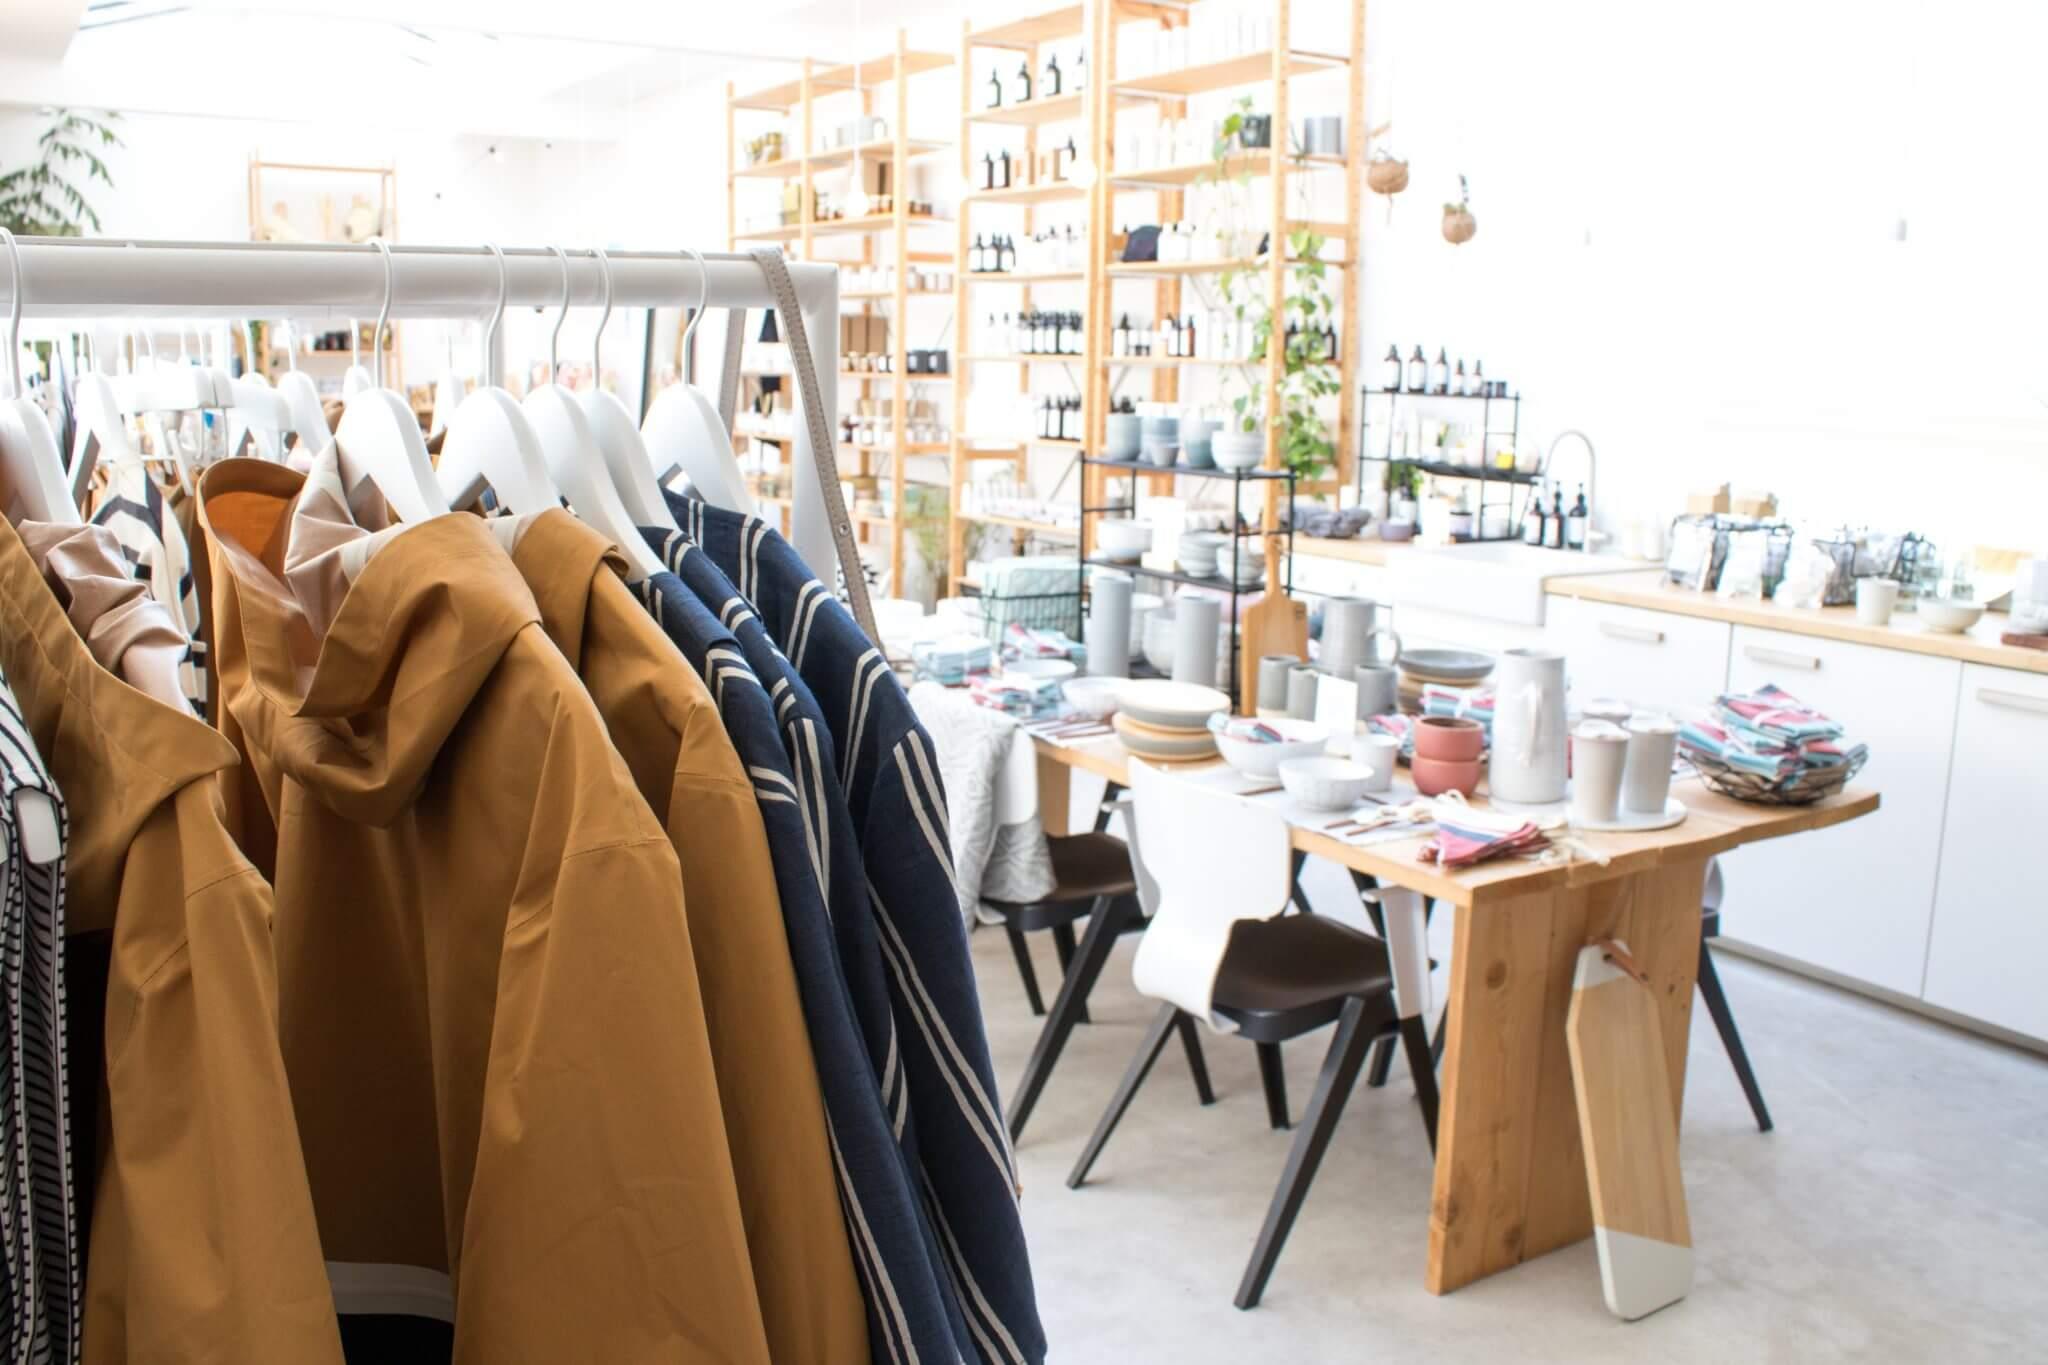 duurzame-kledingwinkels-in-amsterdam